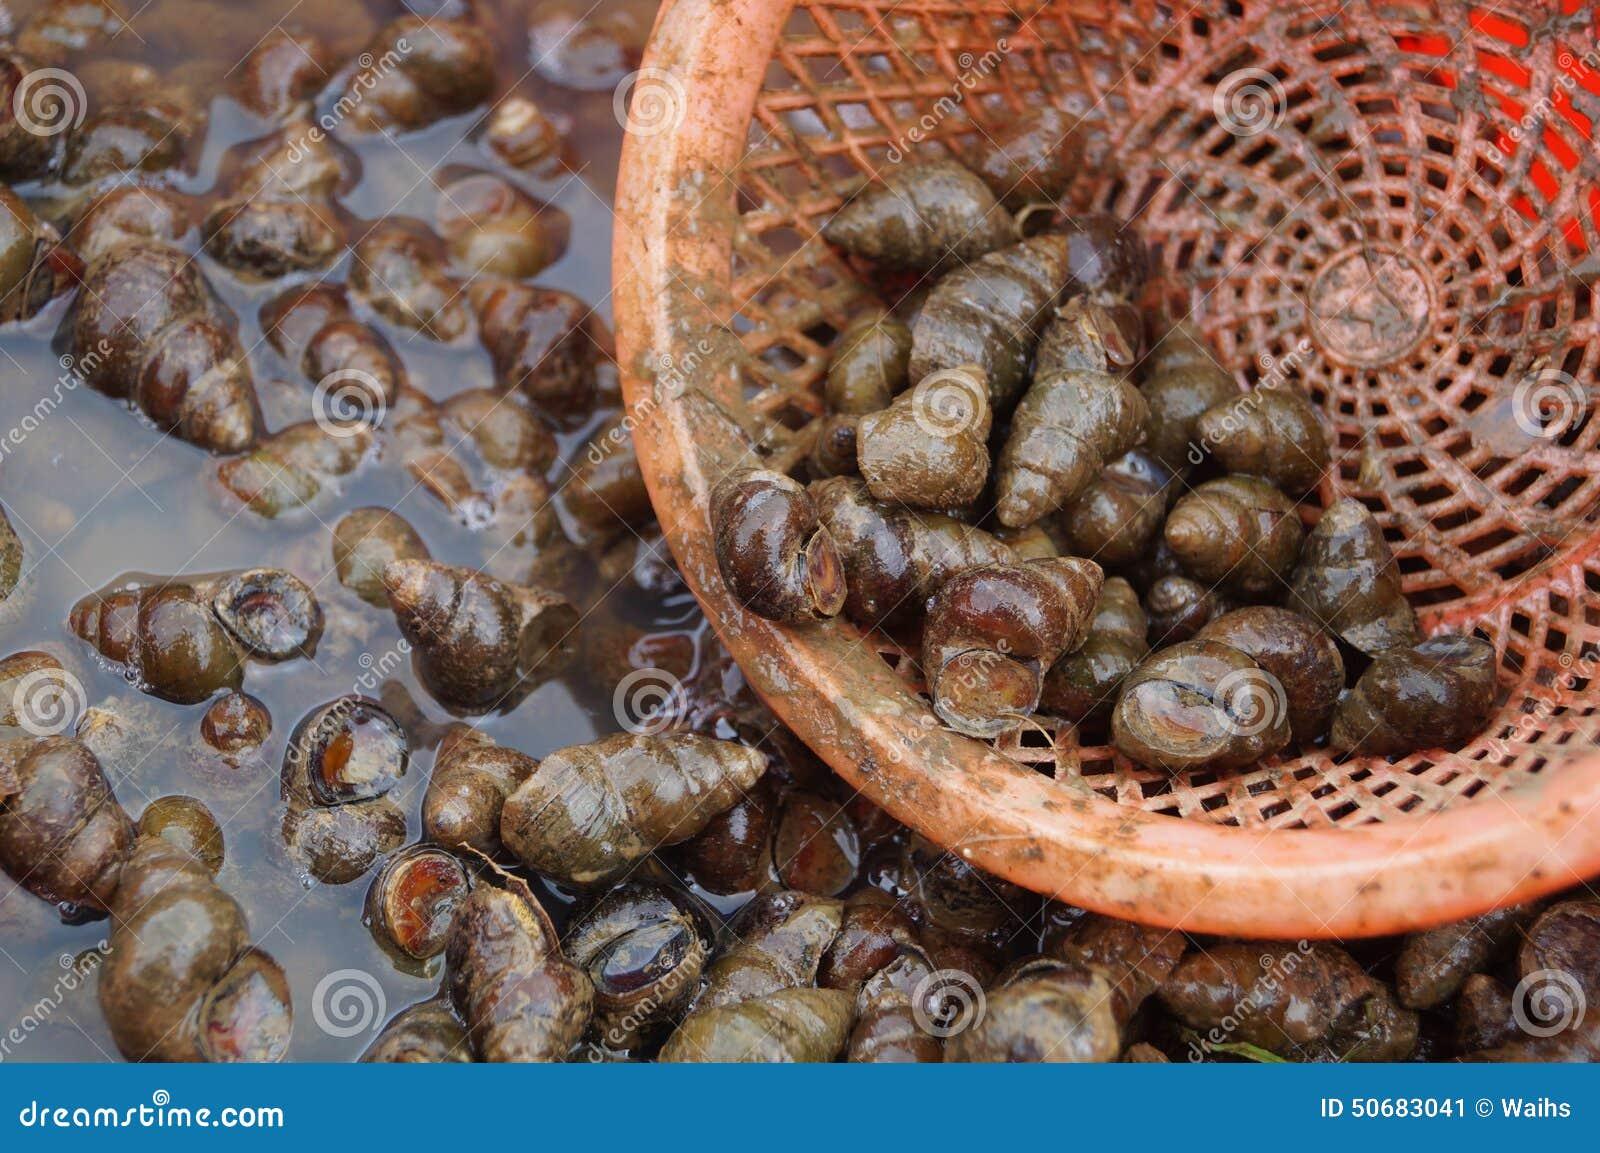 Download 巧克力精炼机 库存图片. 图片 包括有 茴香, 巧克力精炼机, 对象, 生活, 传记, 仍然, 食物, 海洋 - 50683041